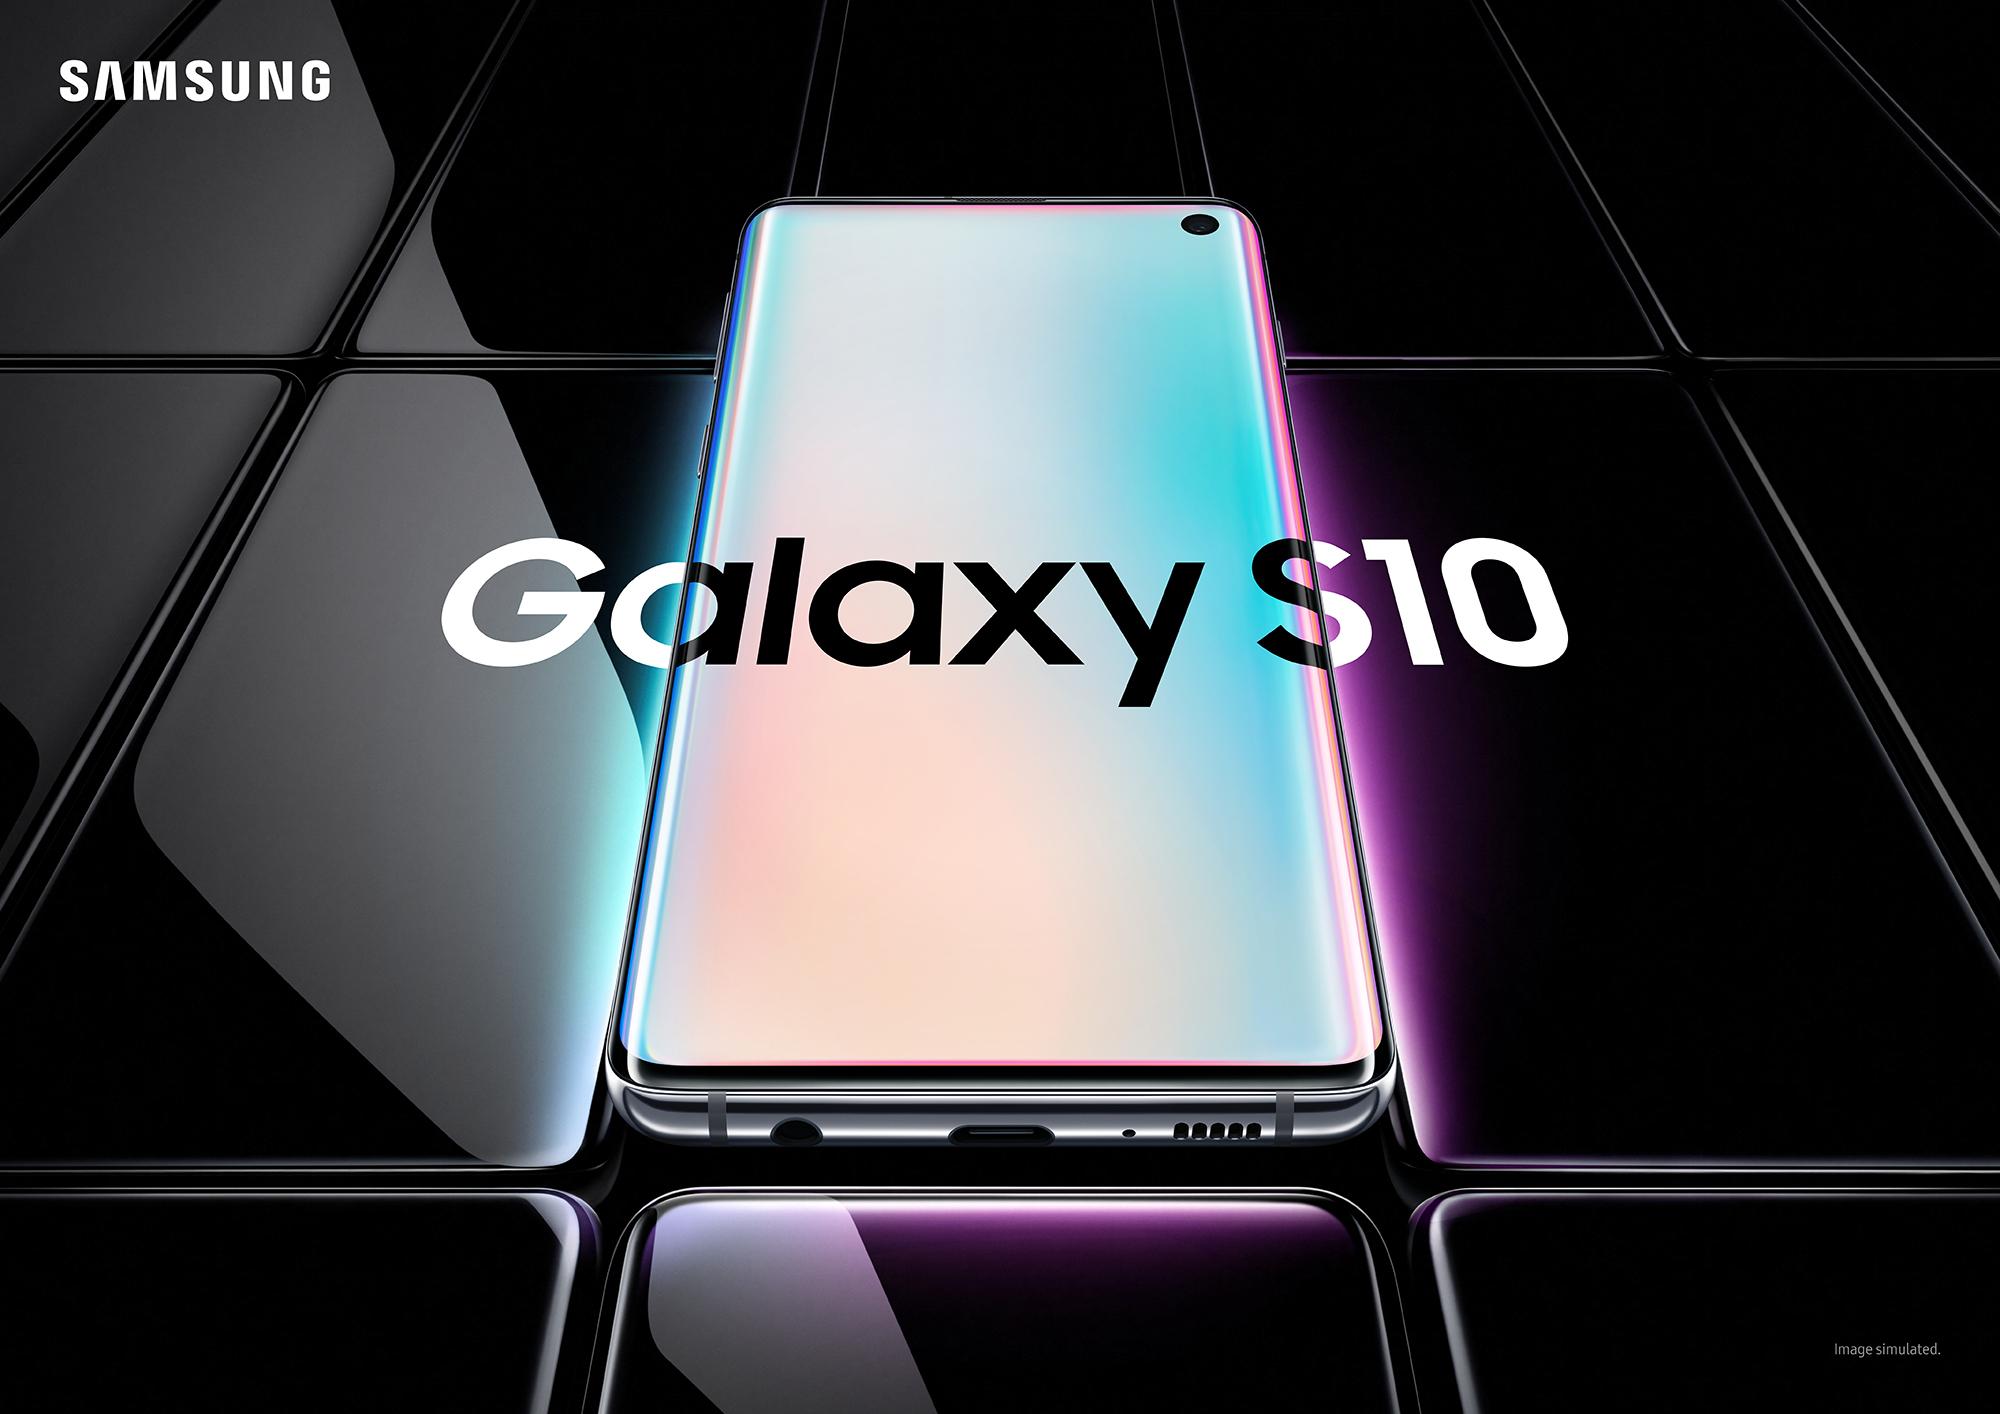 Samsung Galaxy S10 (i.c.m. 2 jr. onb. internet + onb. belsms) Tele2